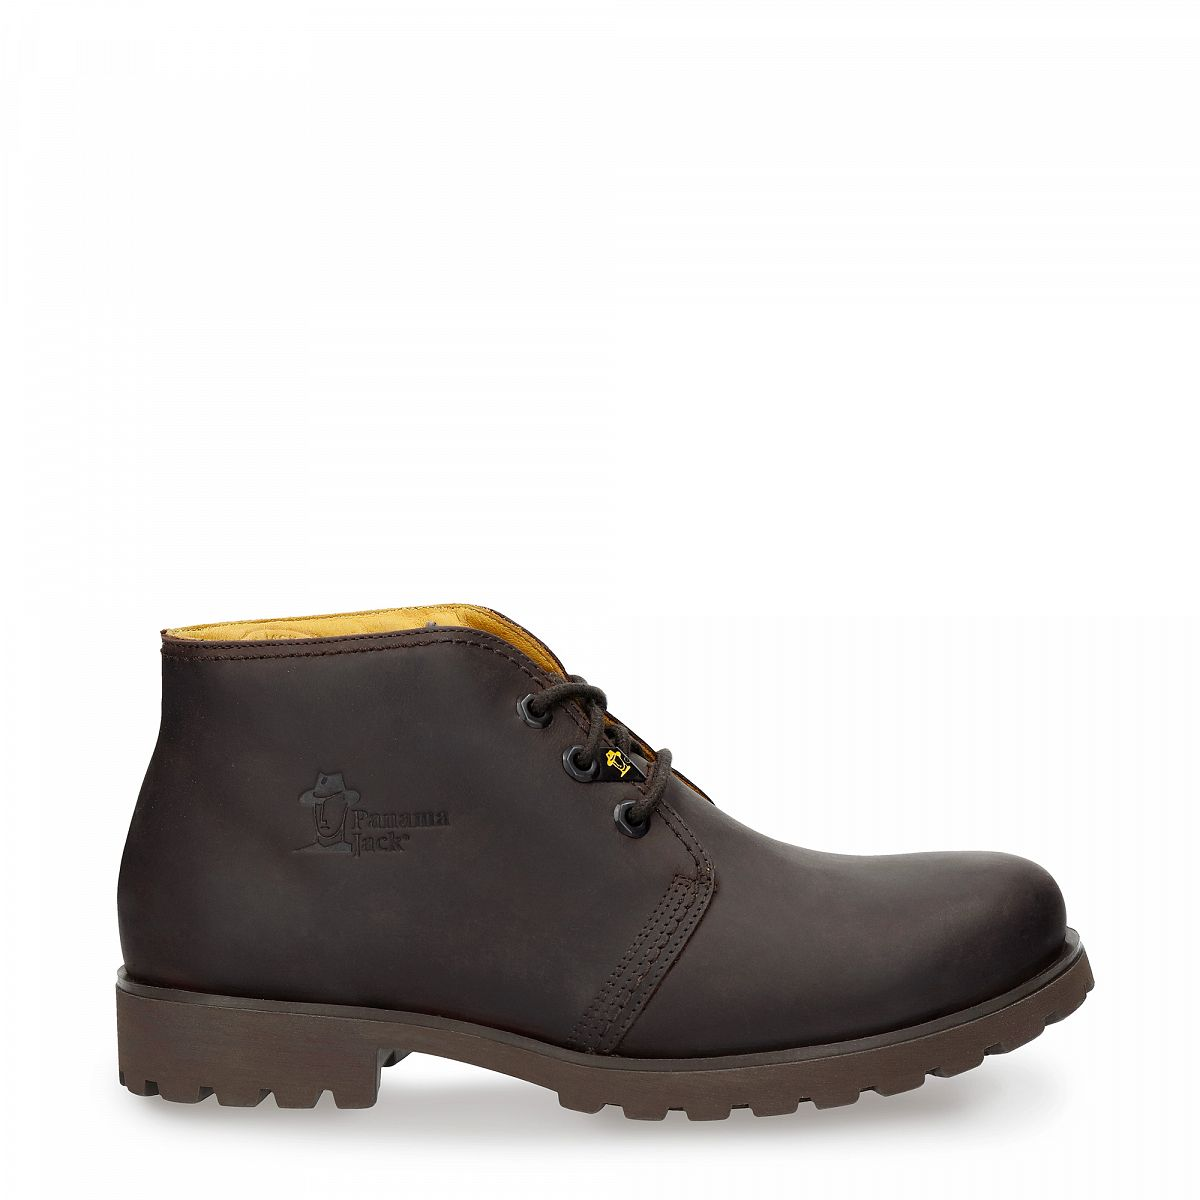 ebee371fd32 Men s ankle boot BOTA PANAMA brown